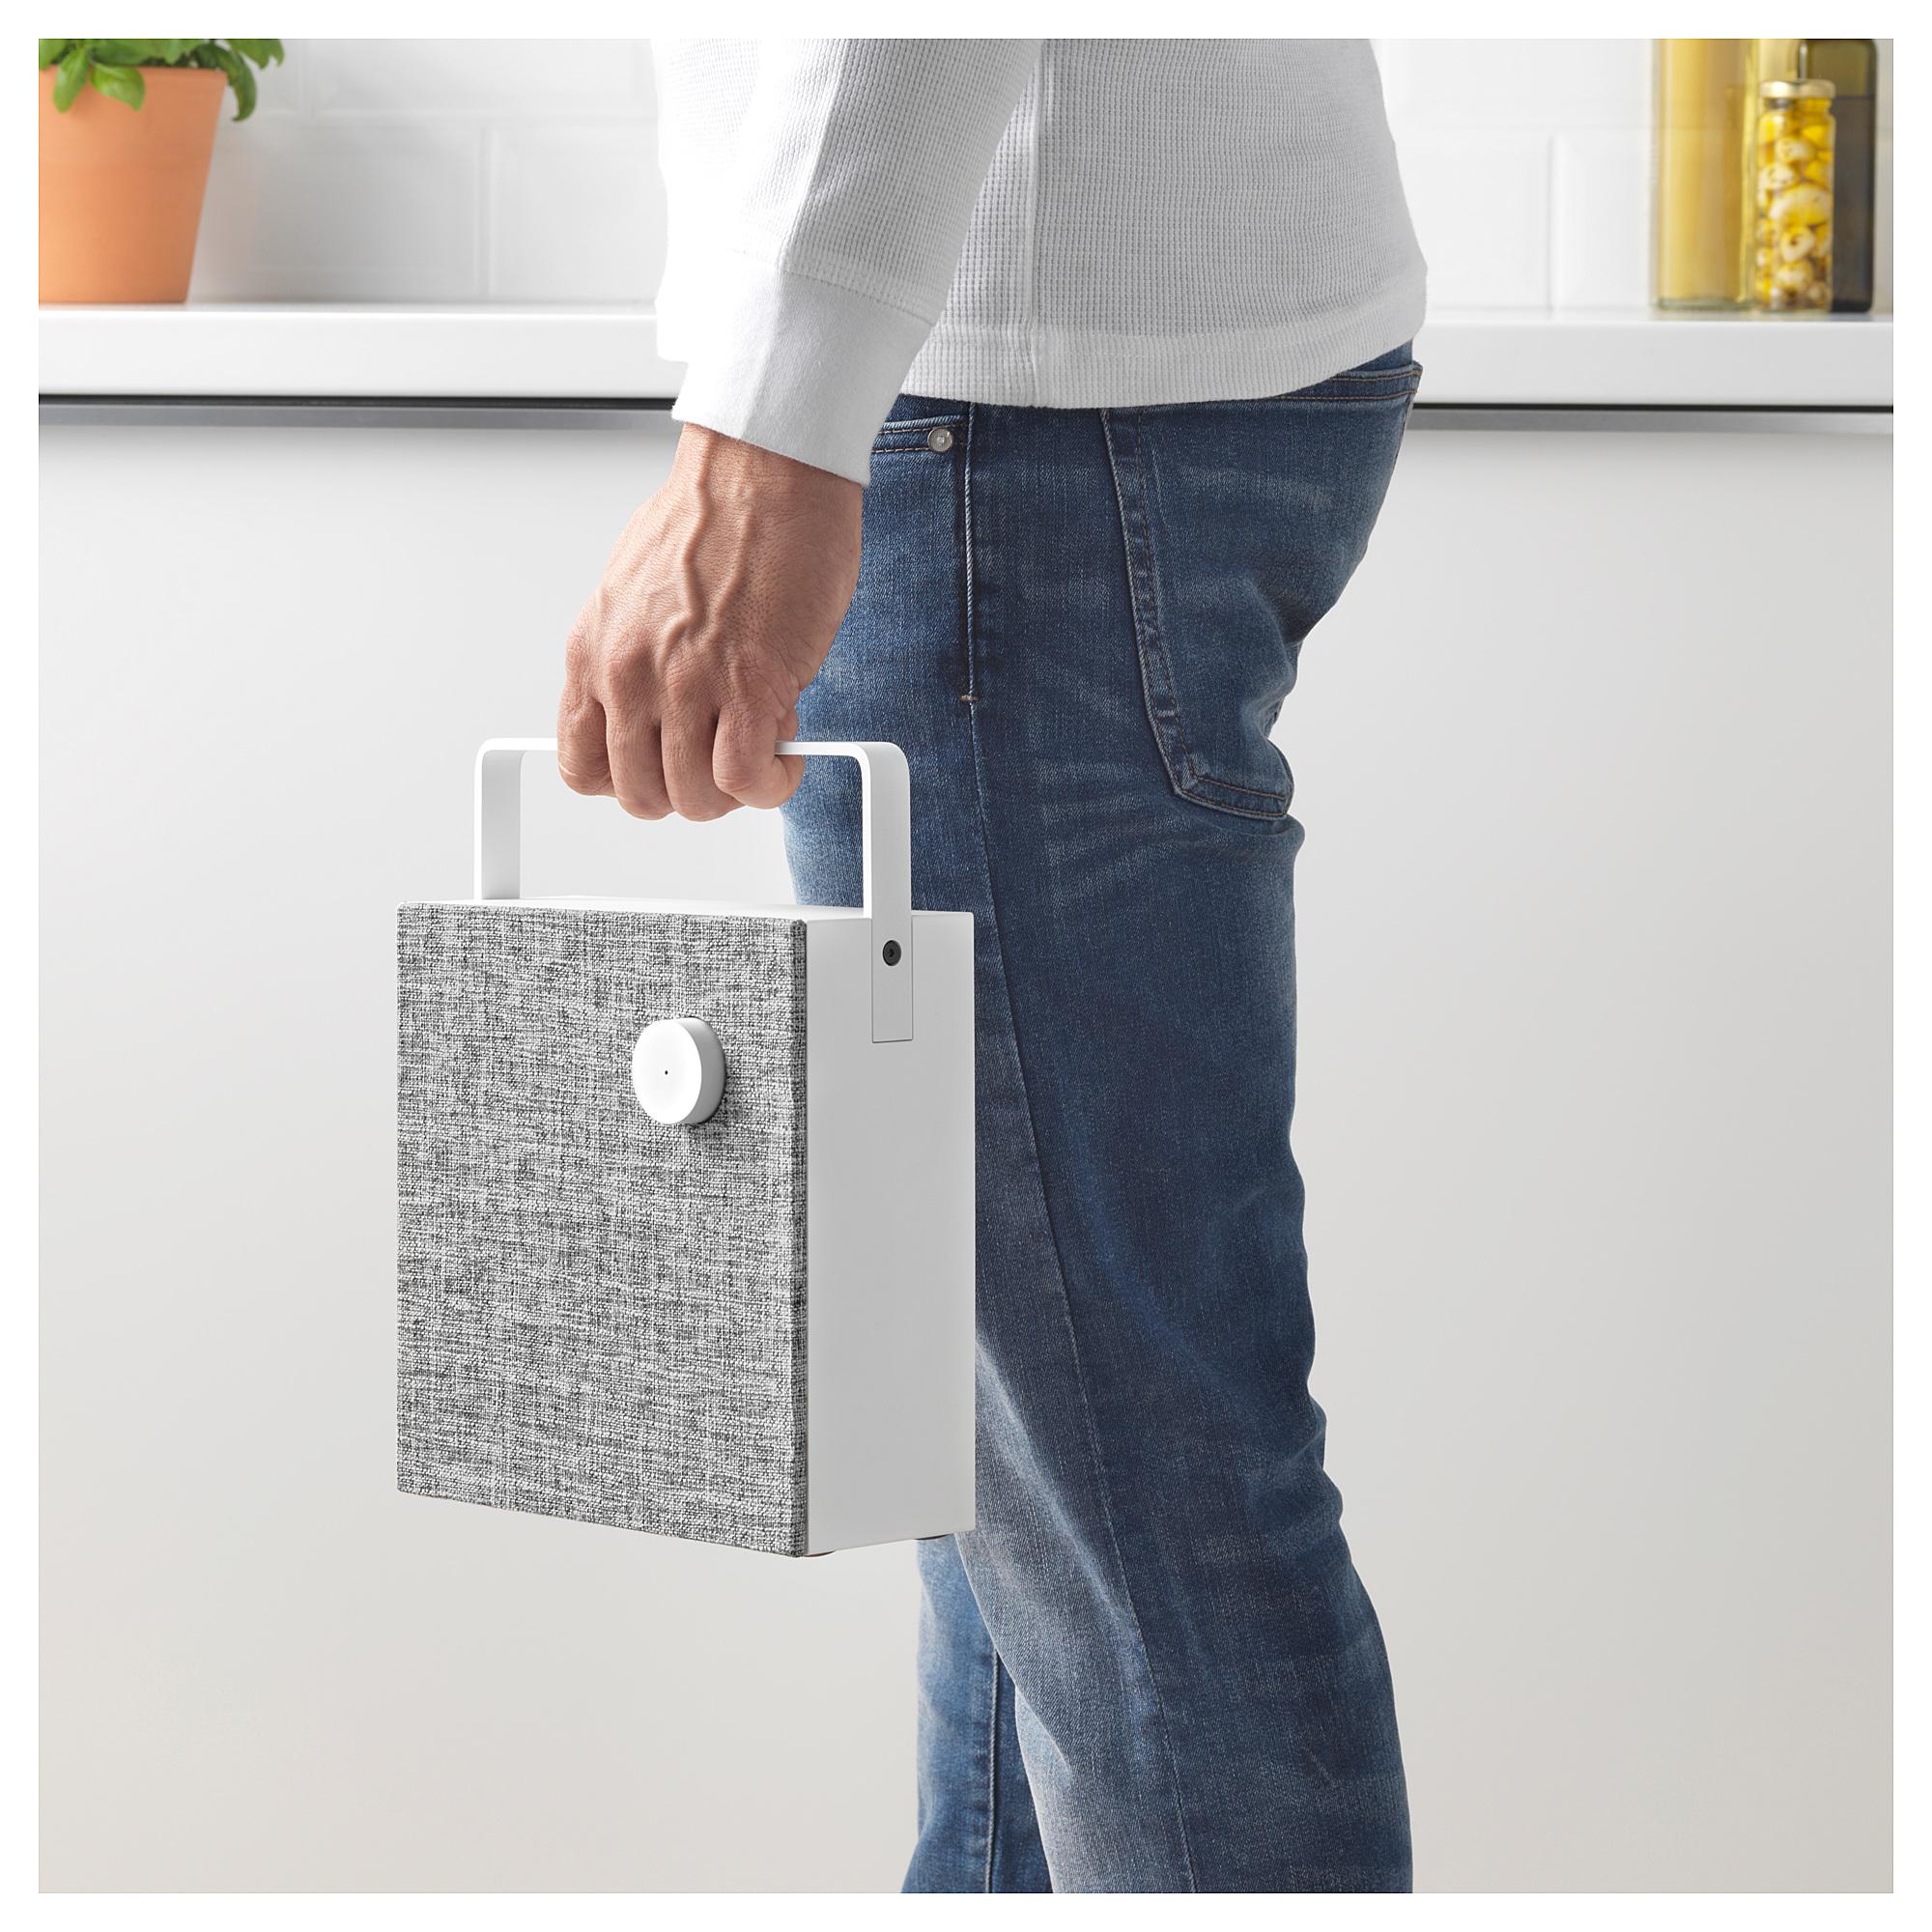 eneby-bluetooth-speaker-white__0566657_pe665044_s5.jpg